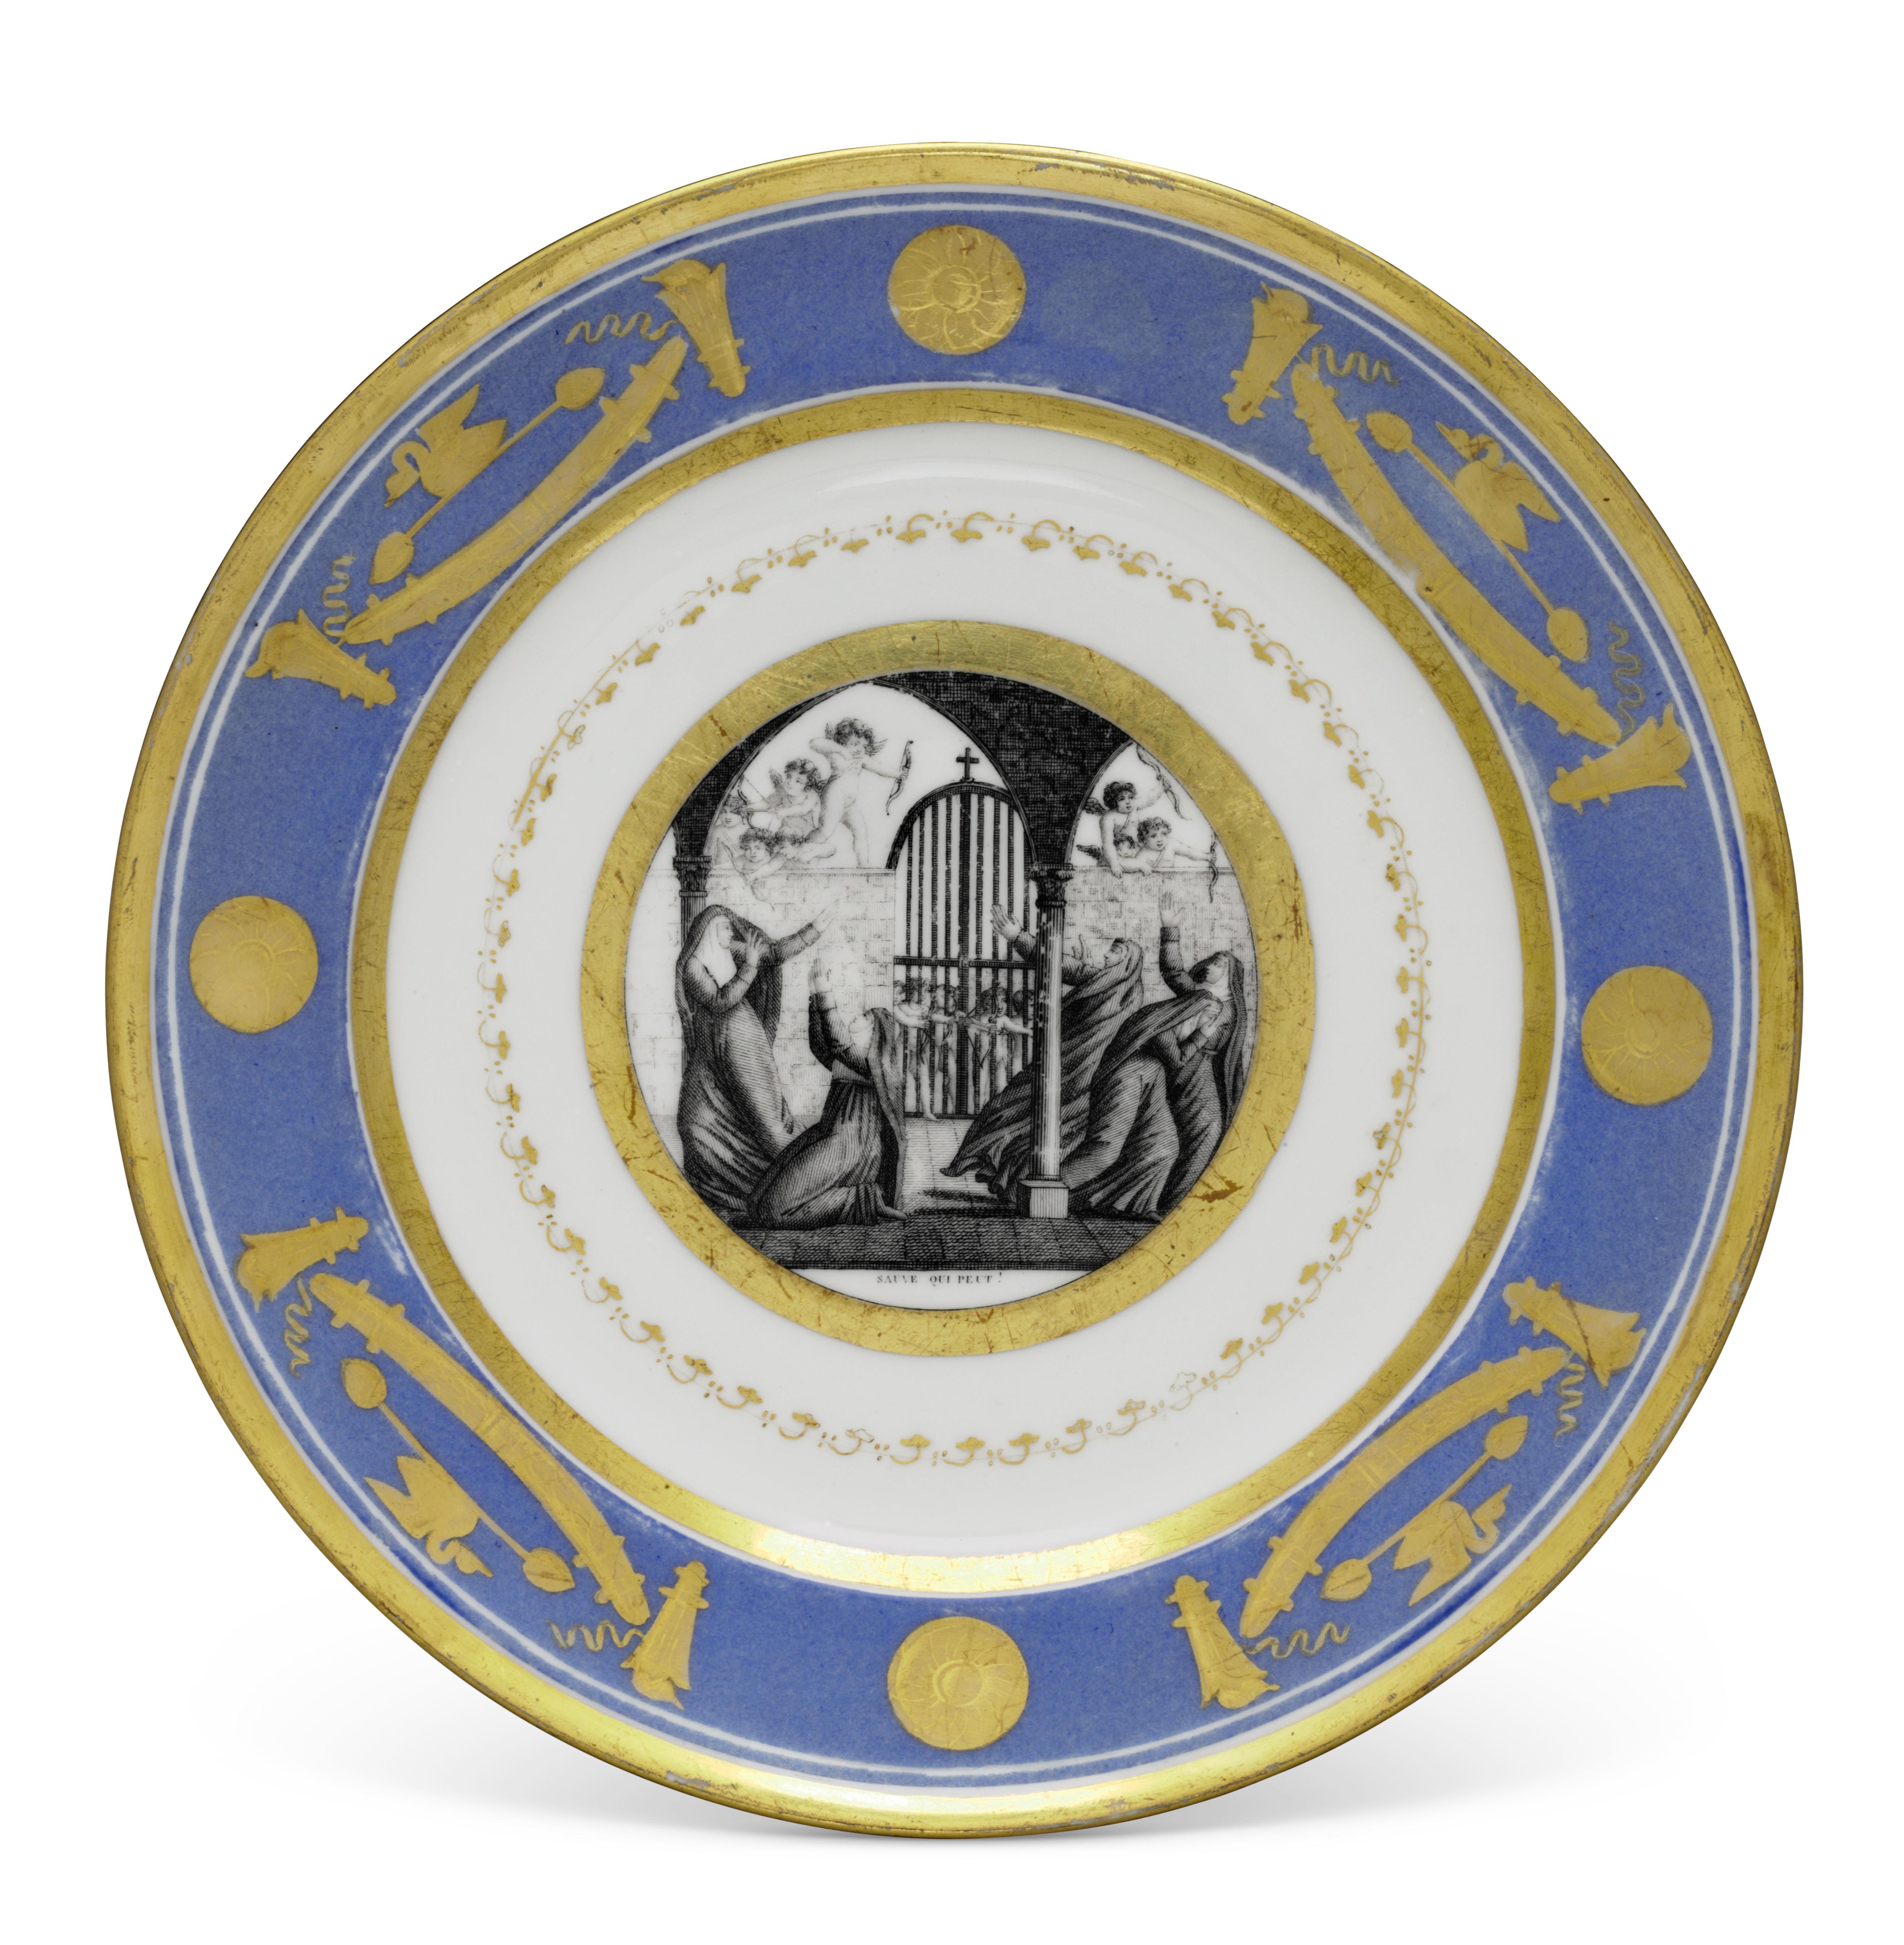 A PARIS (SCHOLCHER) PORCELAIN POWDER-BLUE GROUND PART DESSERT SERVICE